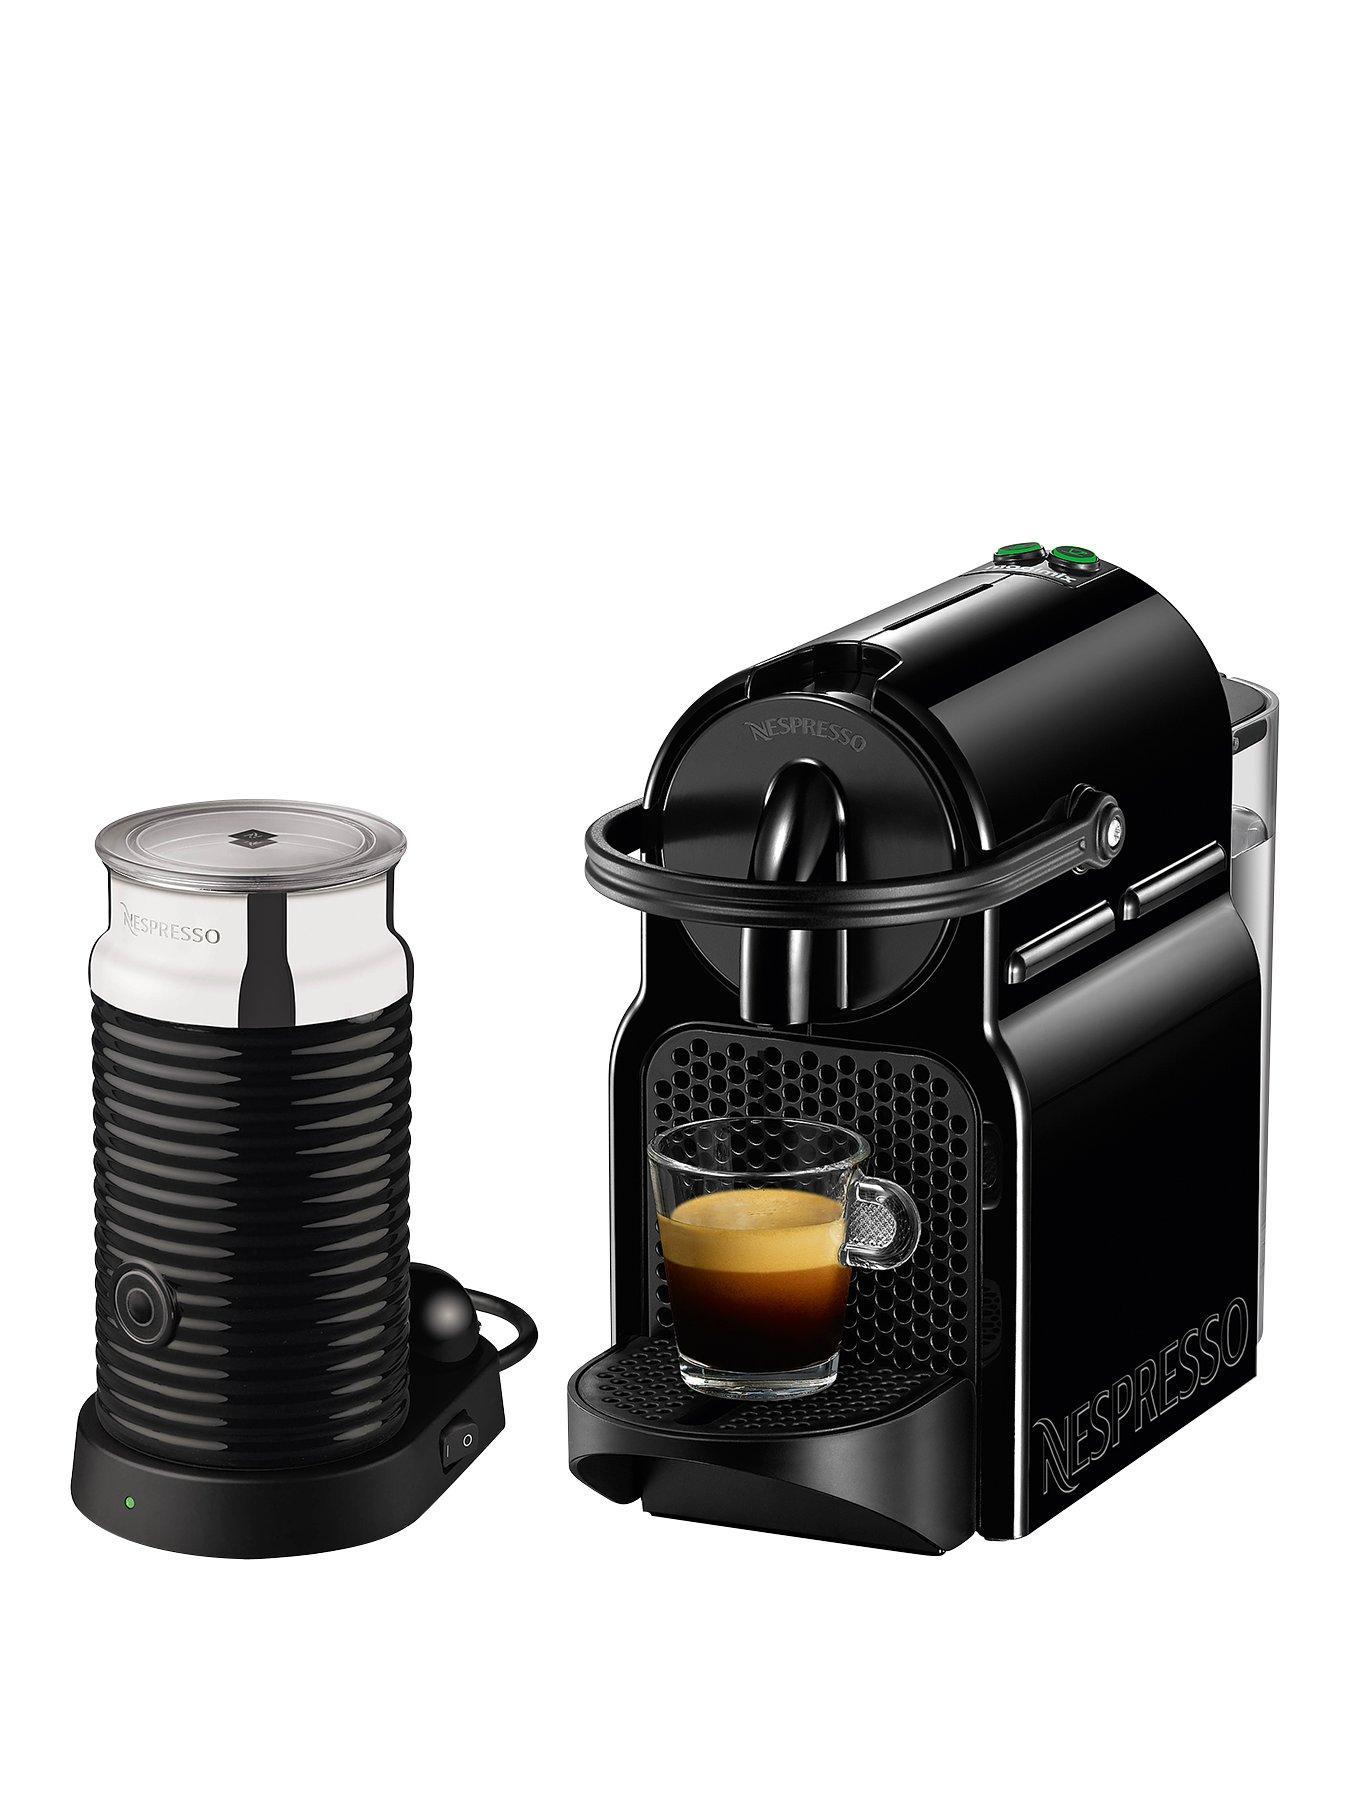 NespressoBrand Littlewoodsireland ie Store Store NespressoBrand 8m0vNnwO